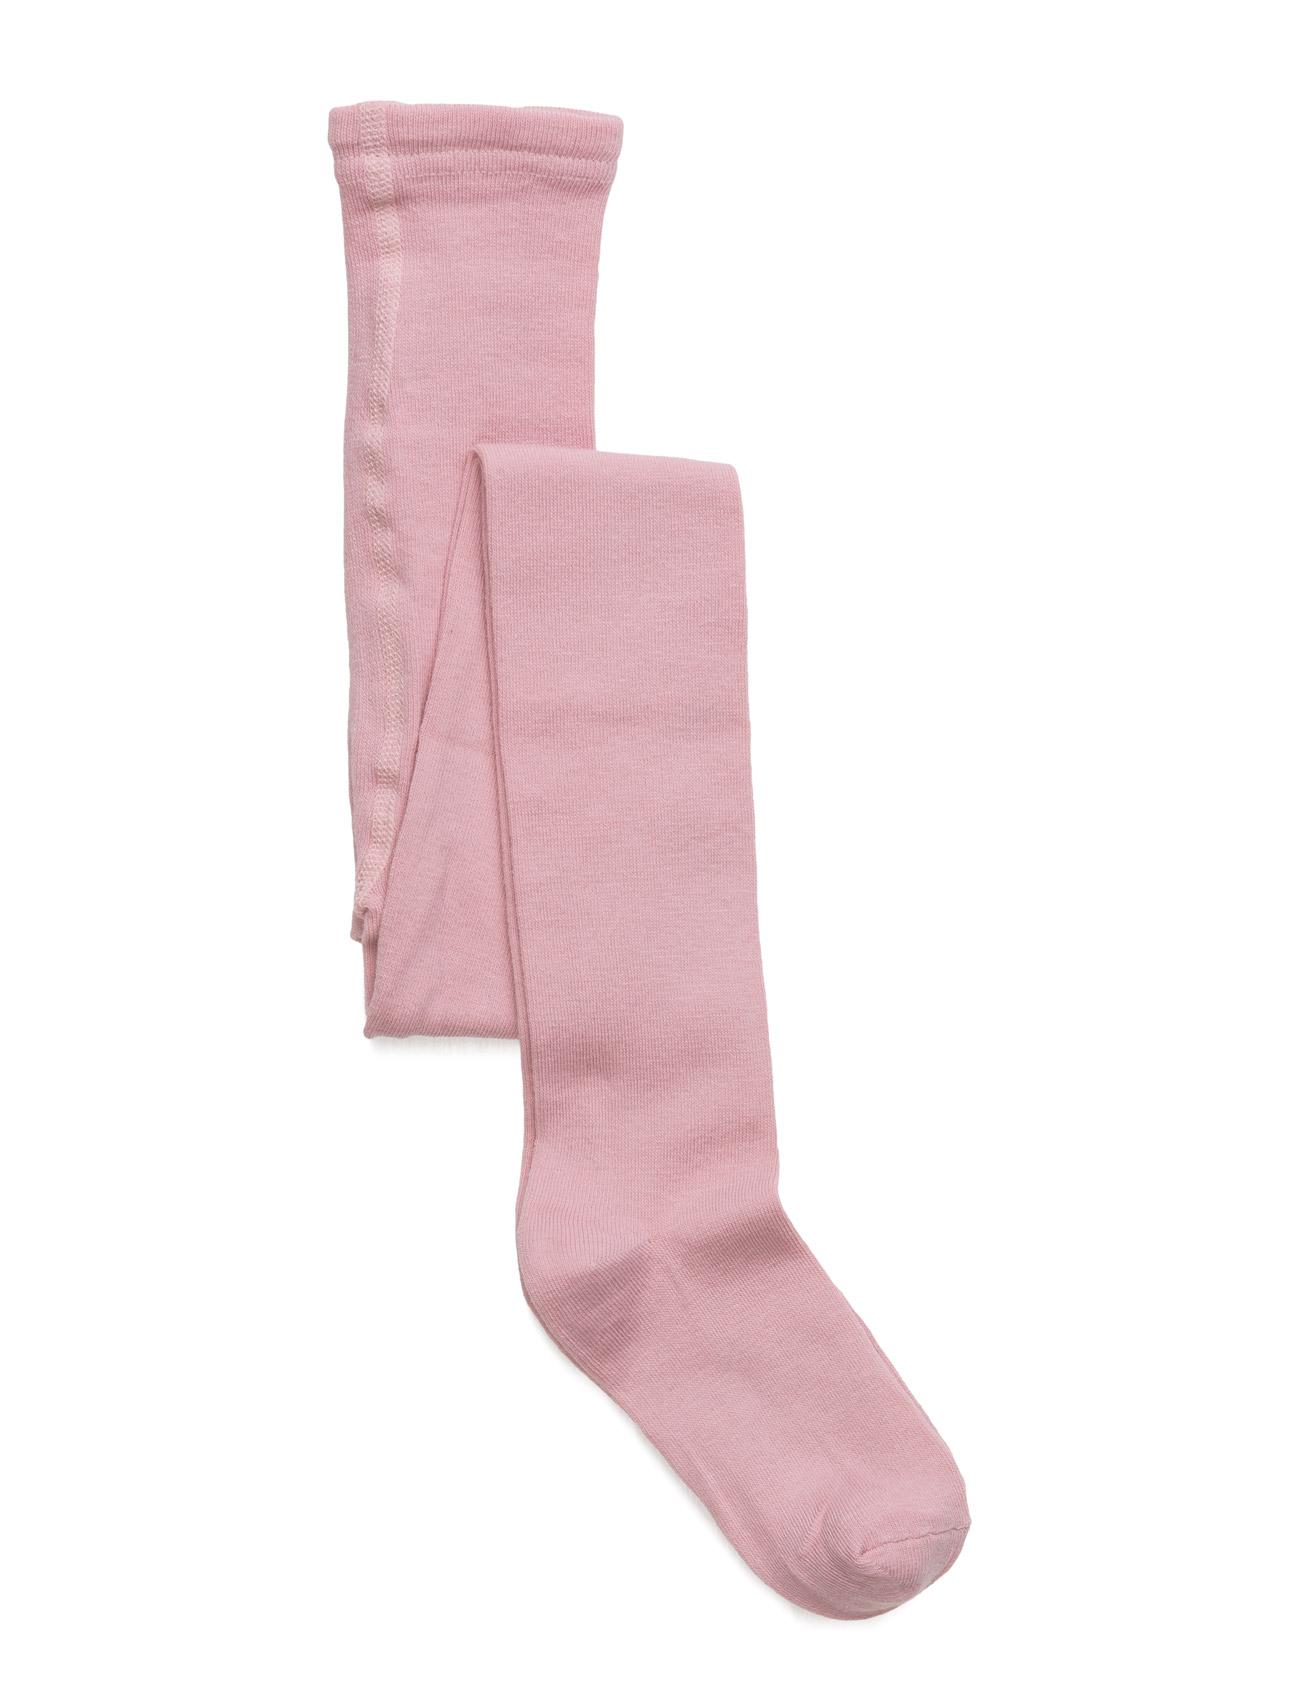 Image of Tight, Plain Colour Girls Socks & Tights Tights Lyserød MELTON (2382480805)